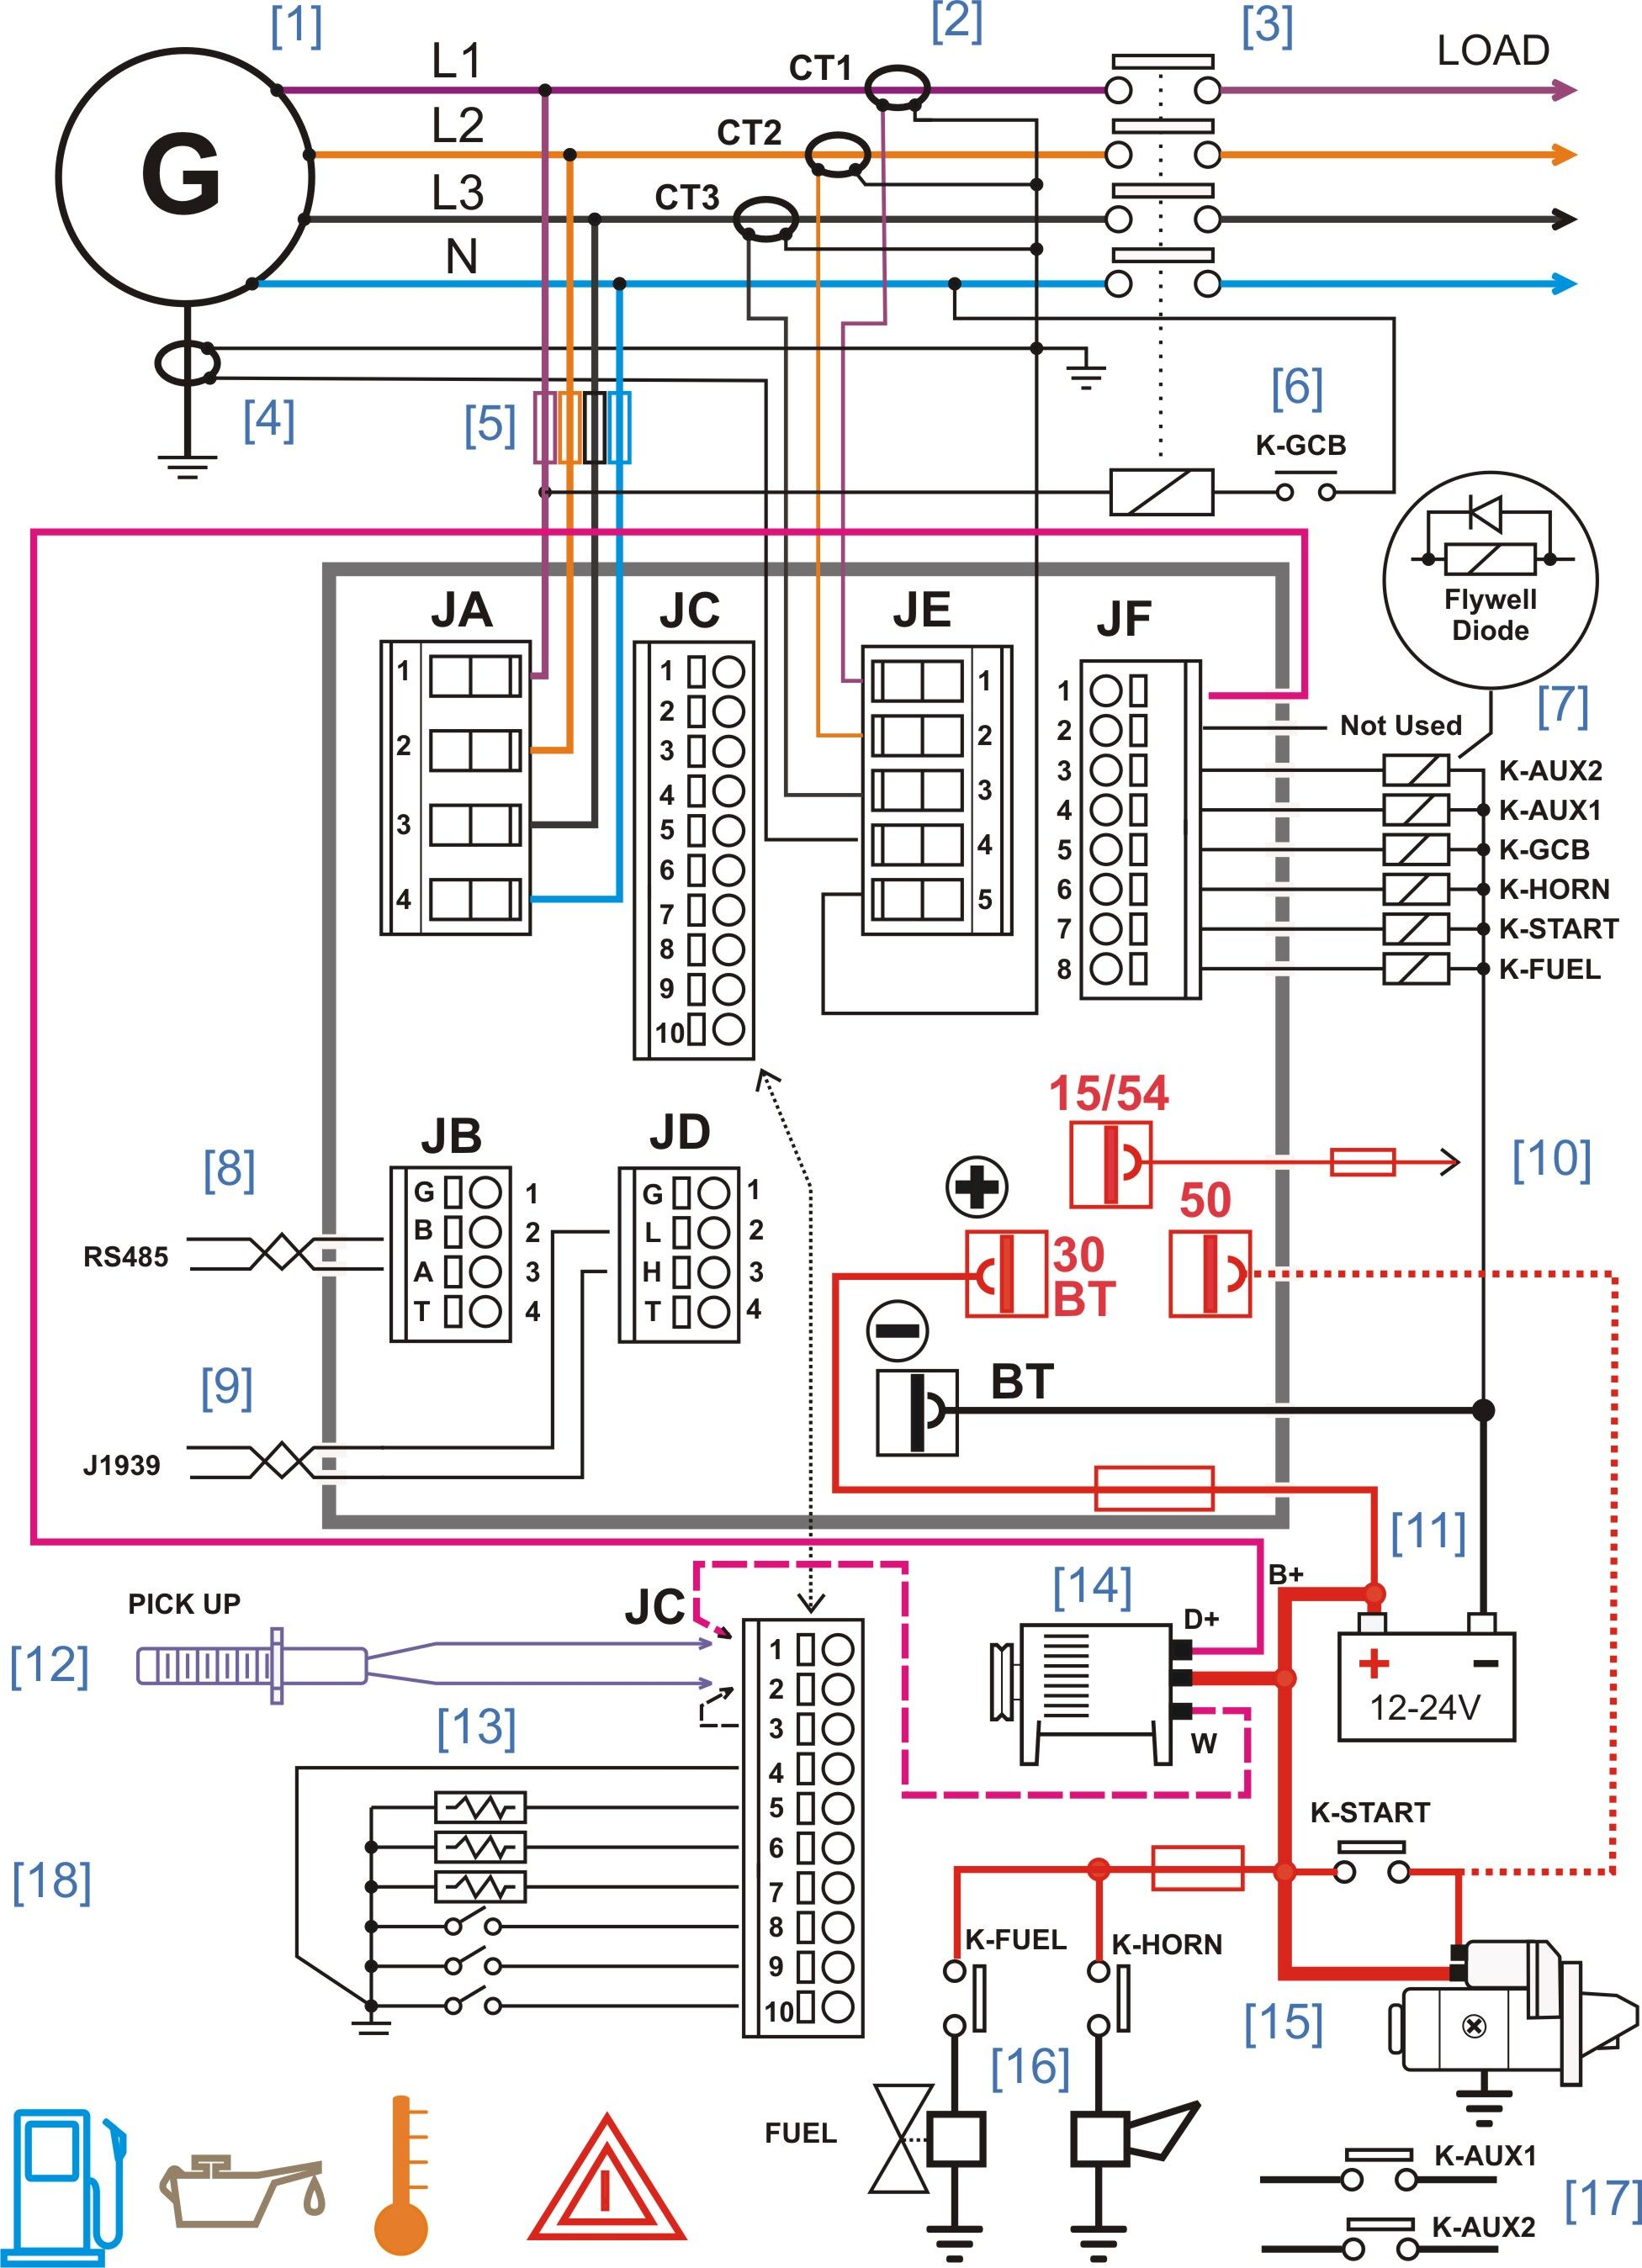 e32695bfa9986573569381a039ba42a6?resize\\\\\\\\\\\\\\\=242258 atlas wiring diagram wiring diagram online